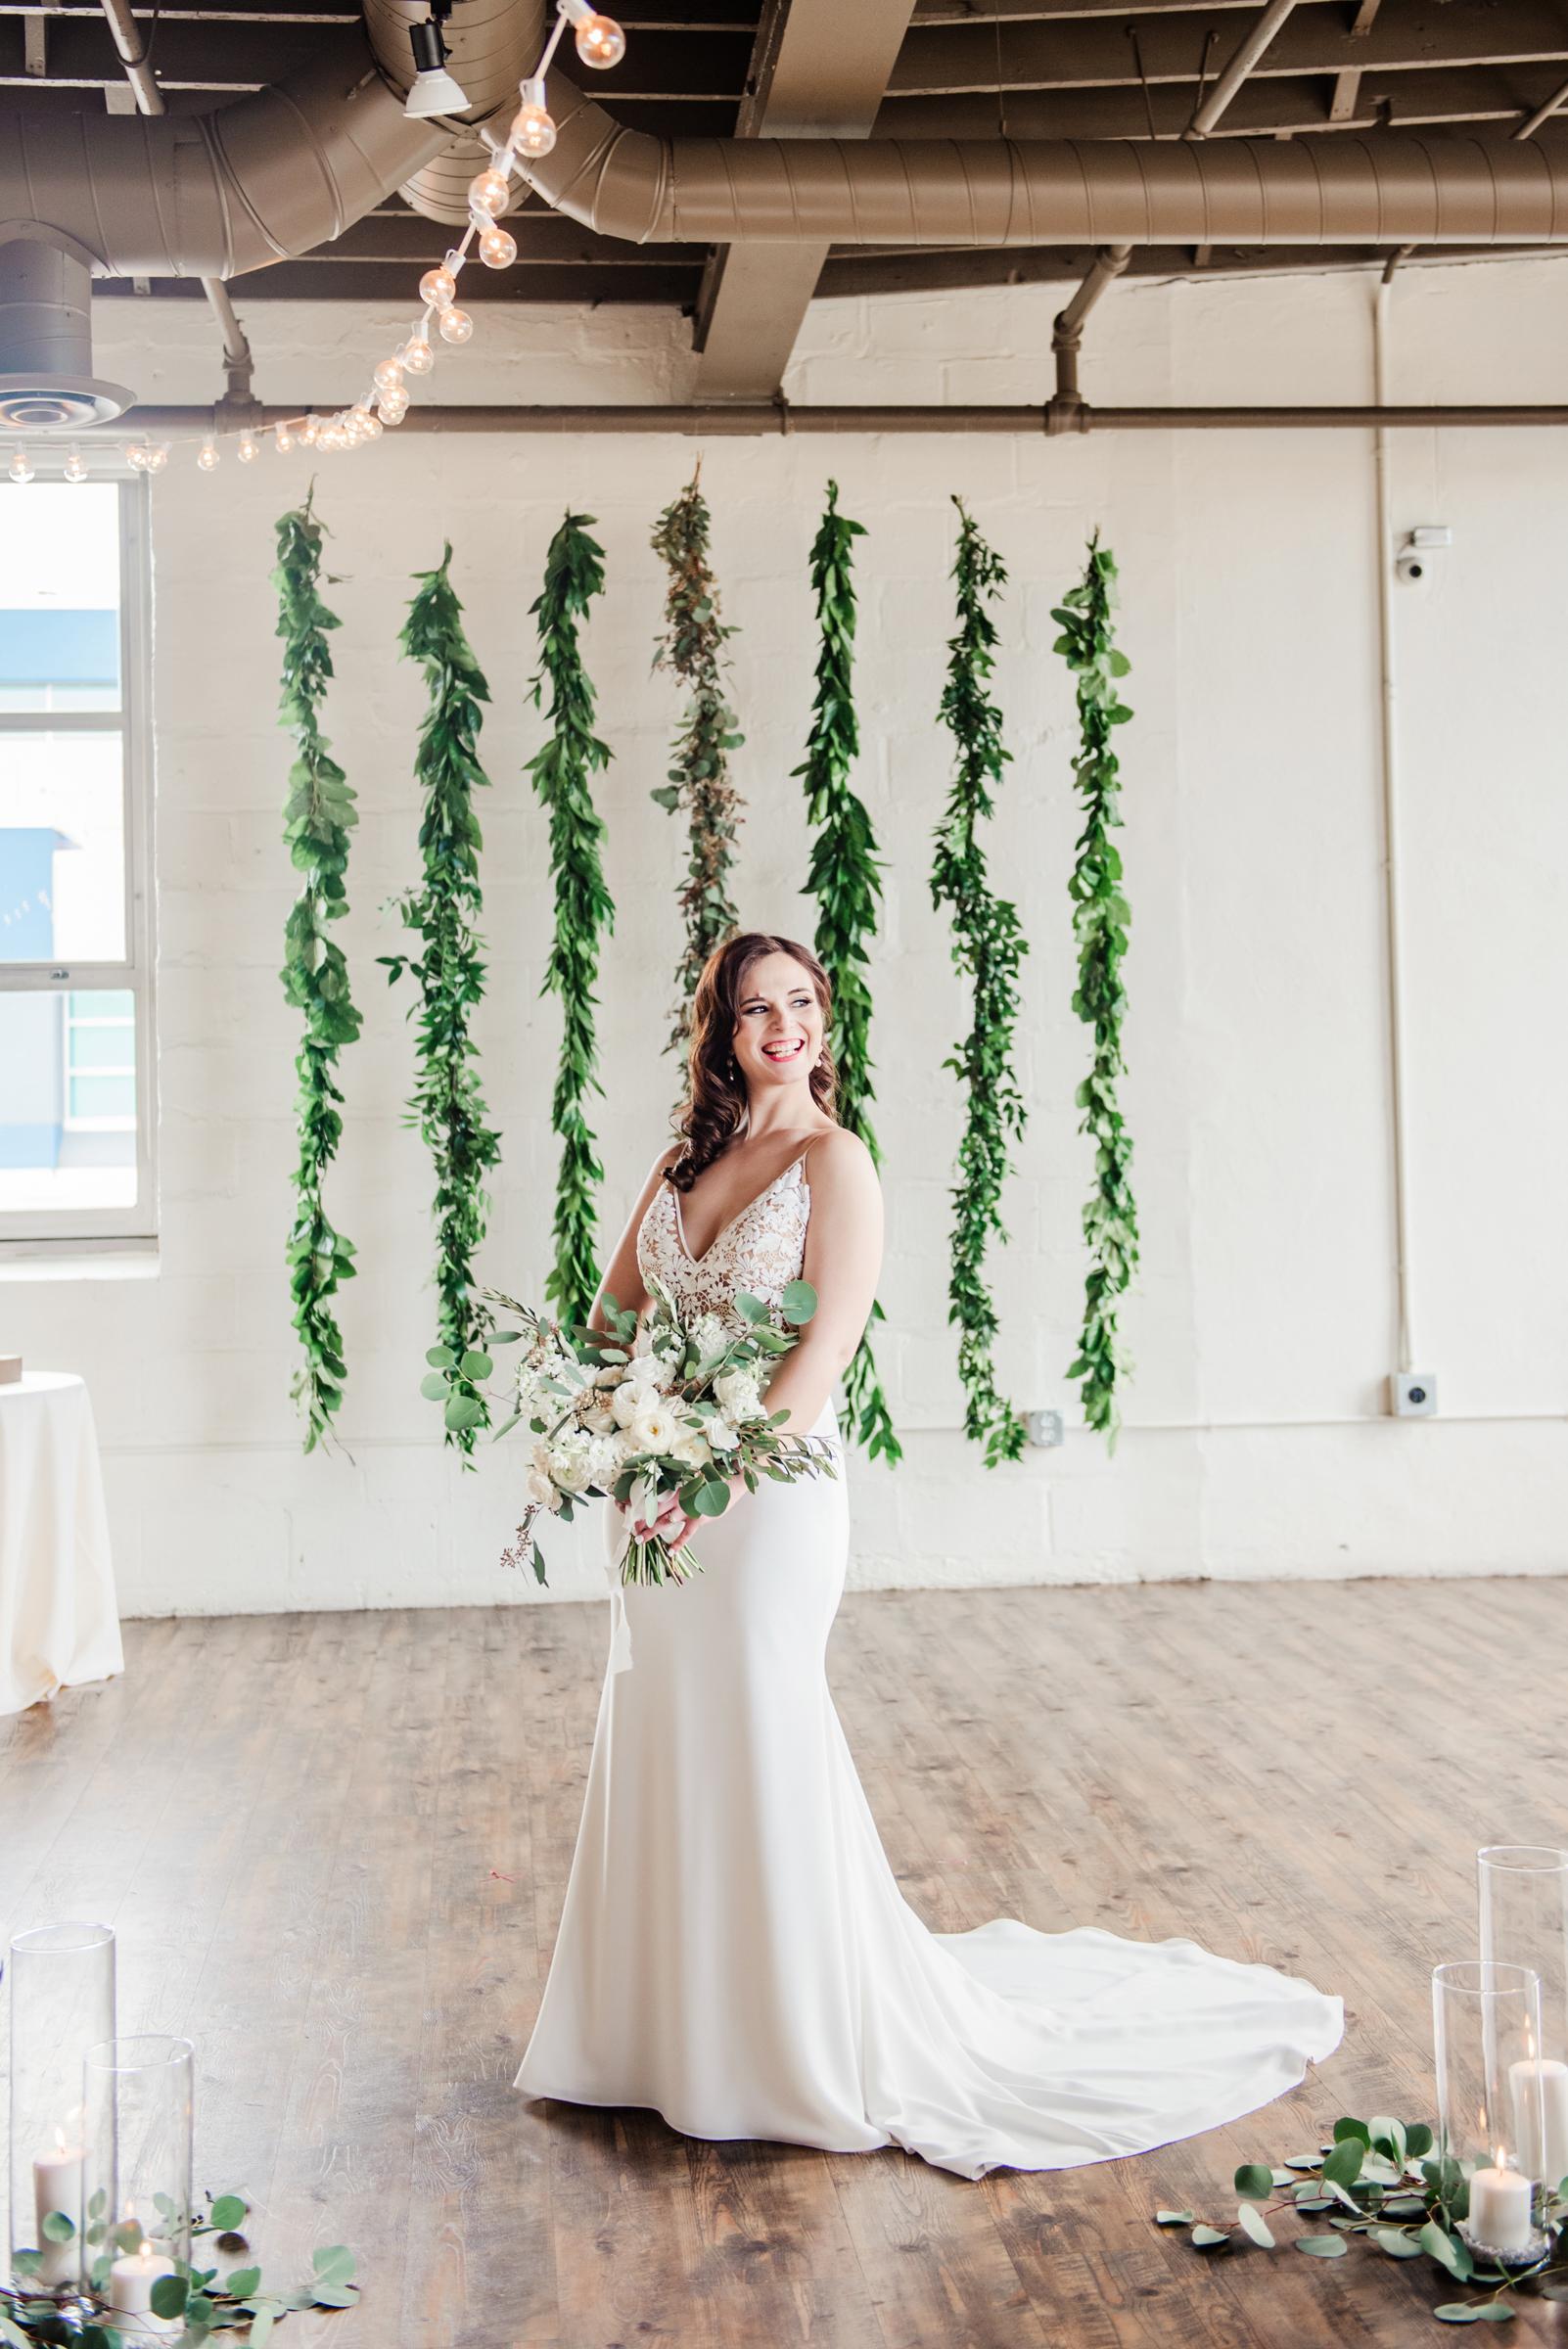 The_Arbor_LoftRochester_Wedding_JILL_STUDIO_Rochester_NY_Photographer_161722.jpg